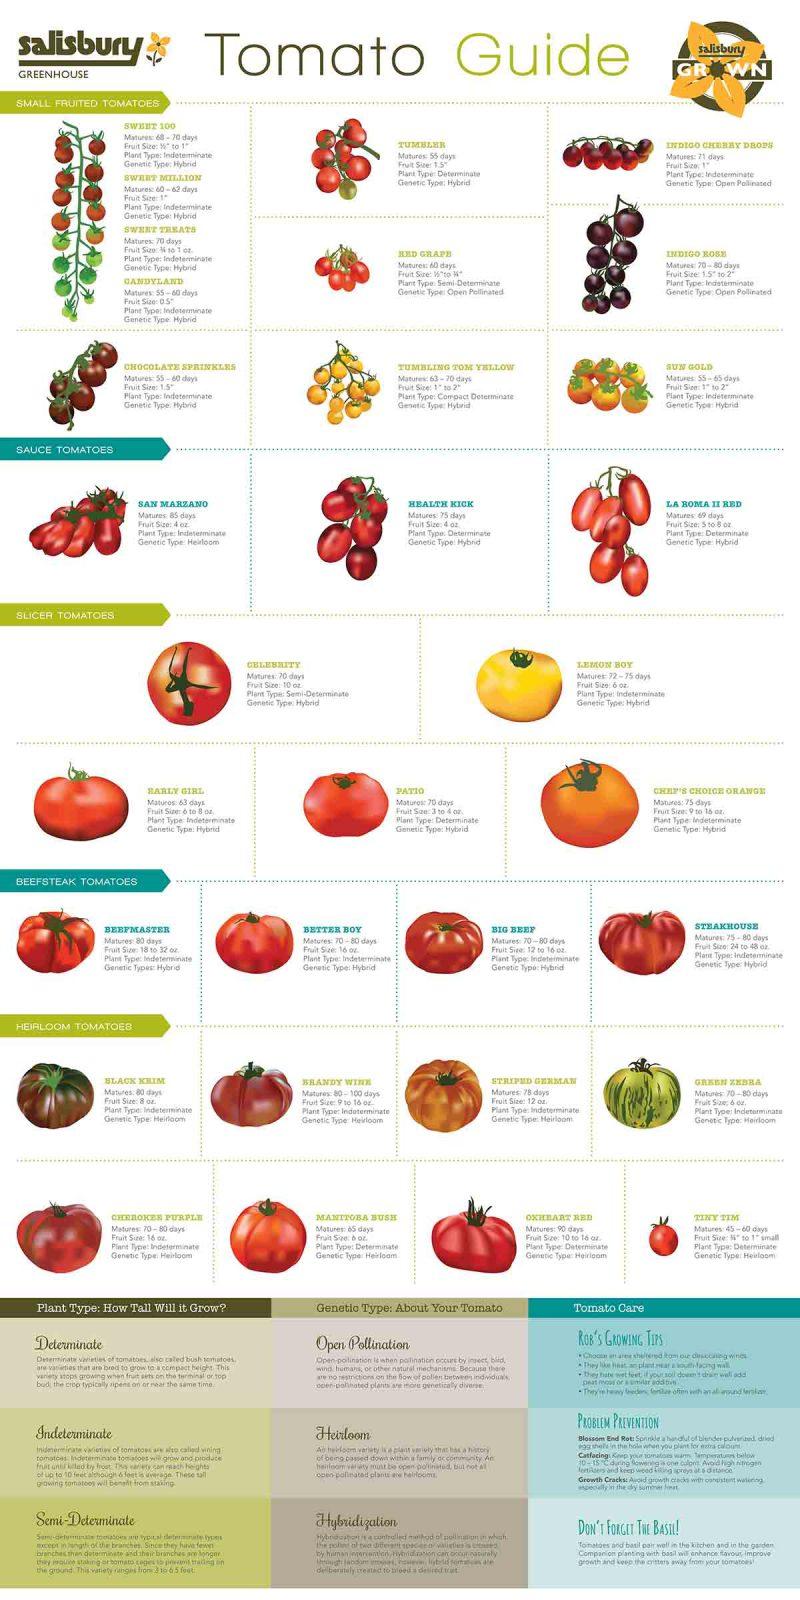 Salisbury Tomato Guide